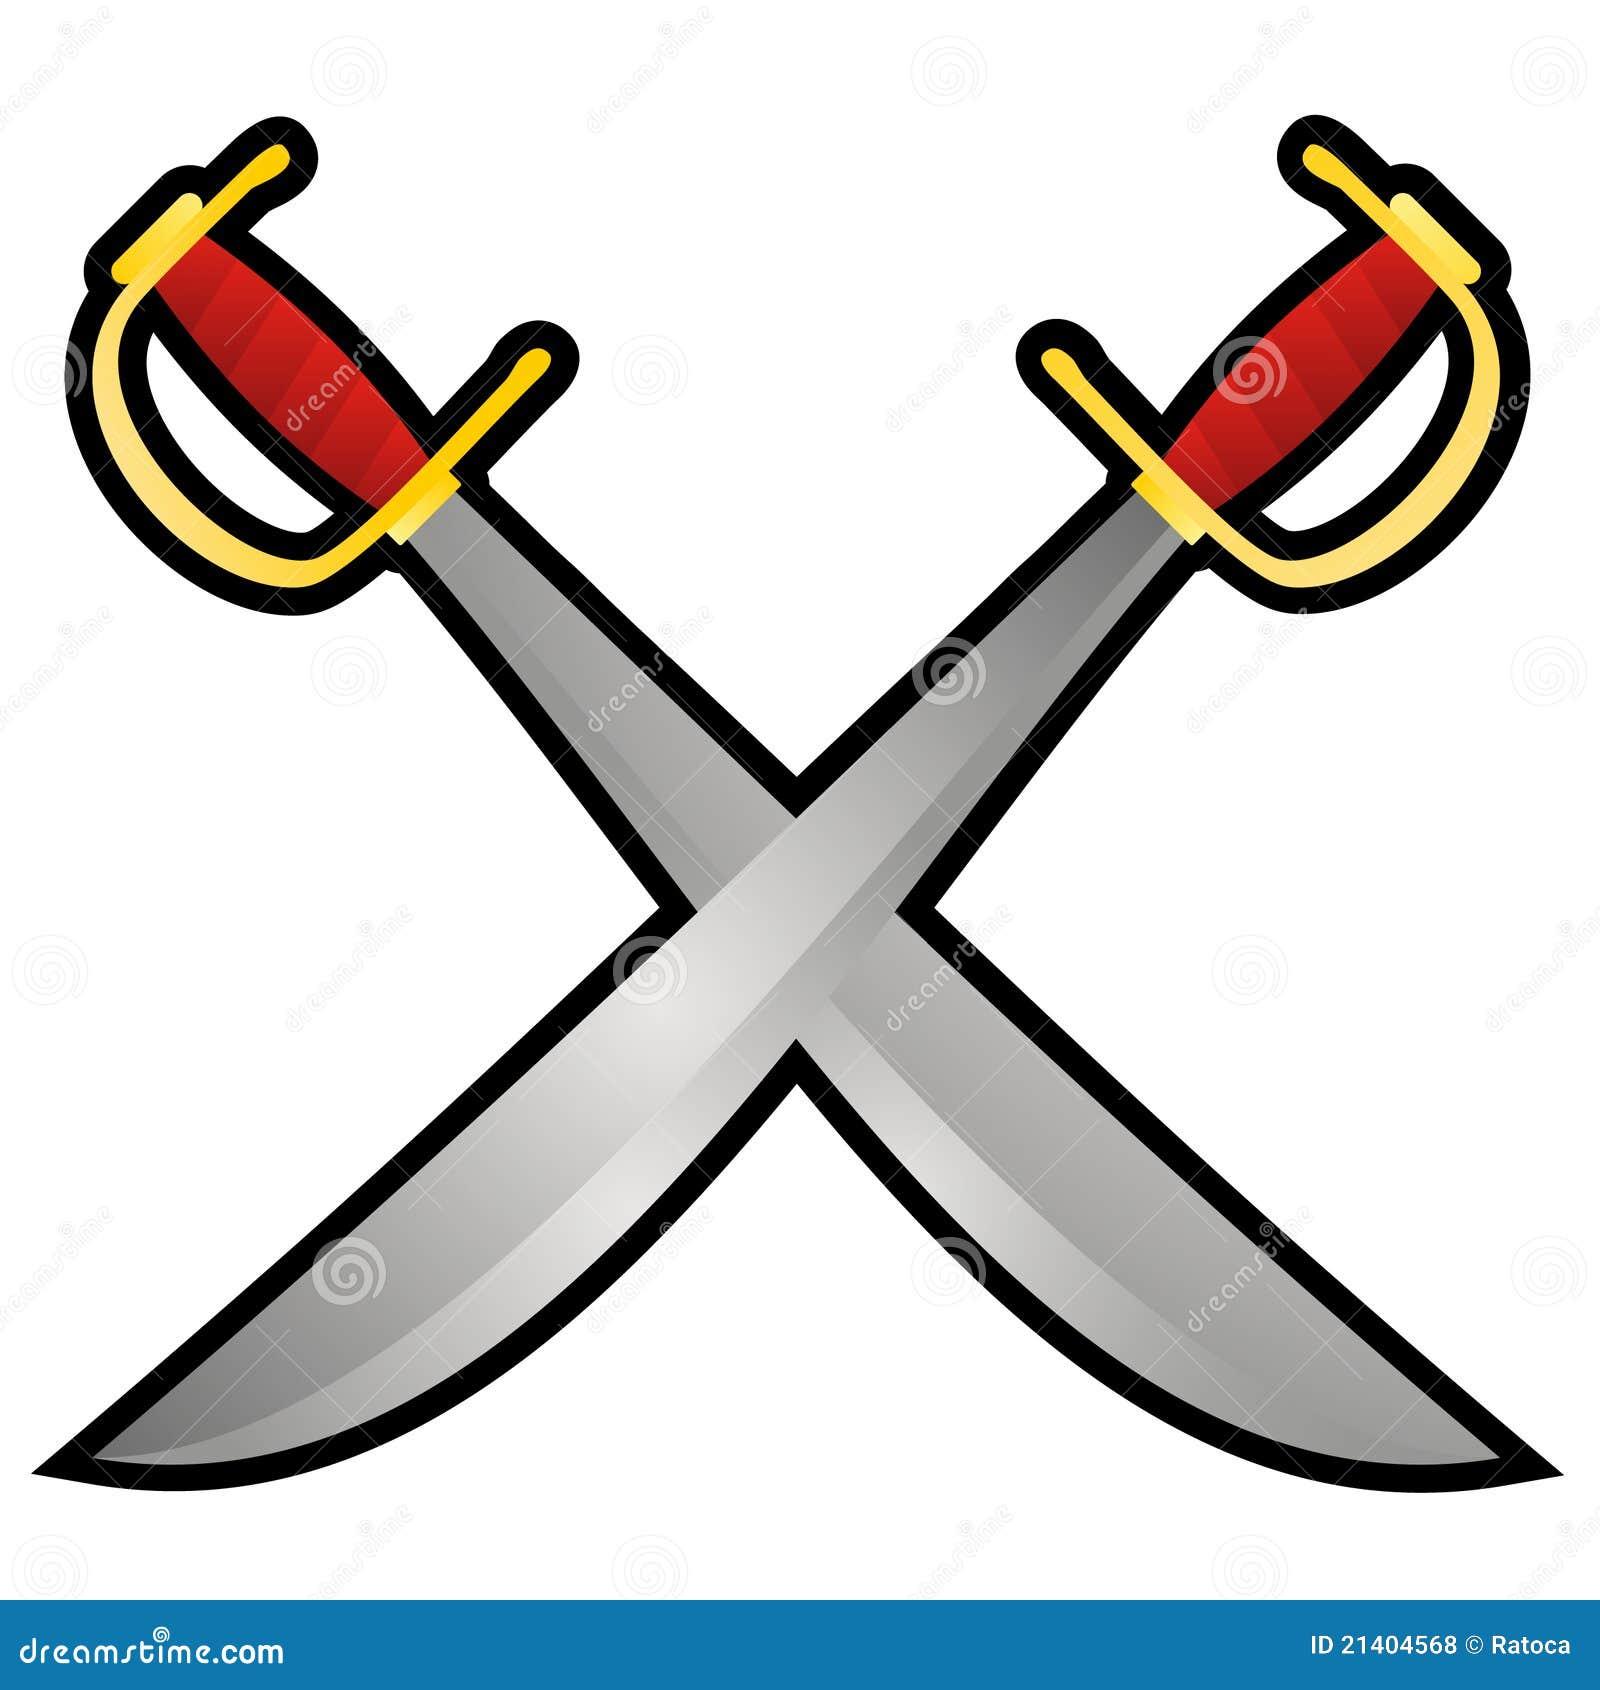 image gallery of crossed pirate swords